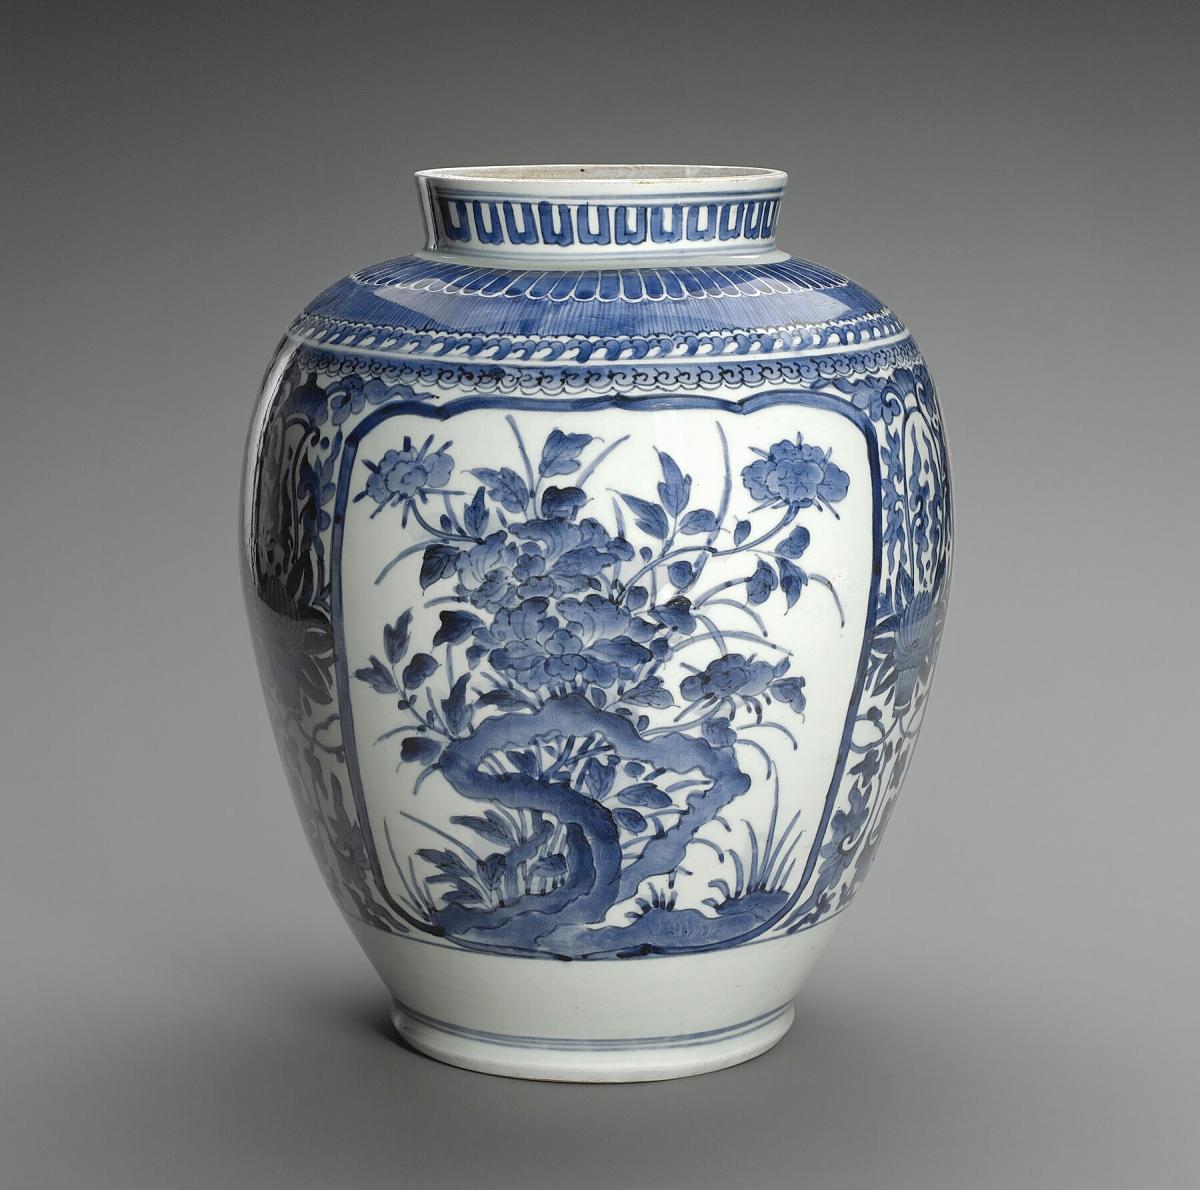 Arita vase, Japanese (Edo), late Seventeenth Century. Ceramic. Sarah Campbell Blaffer Foundation, Houston.